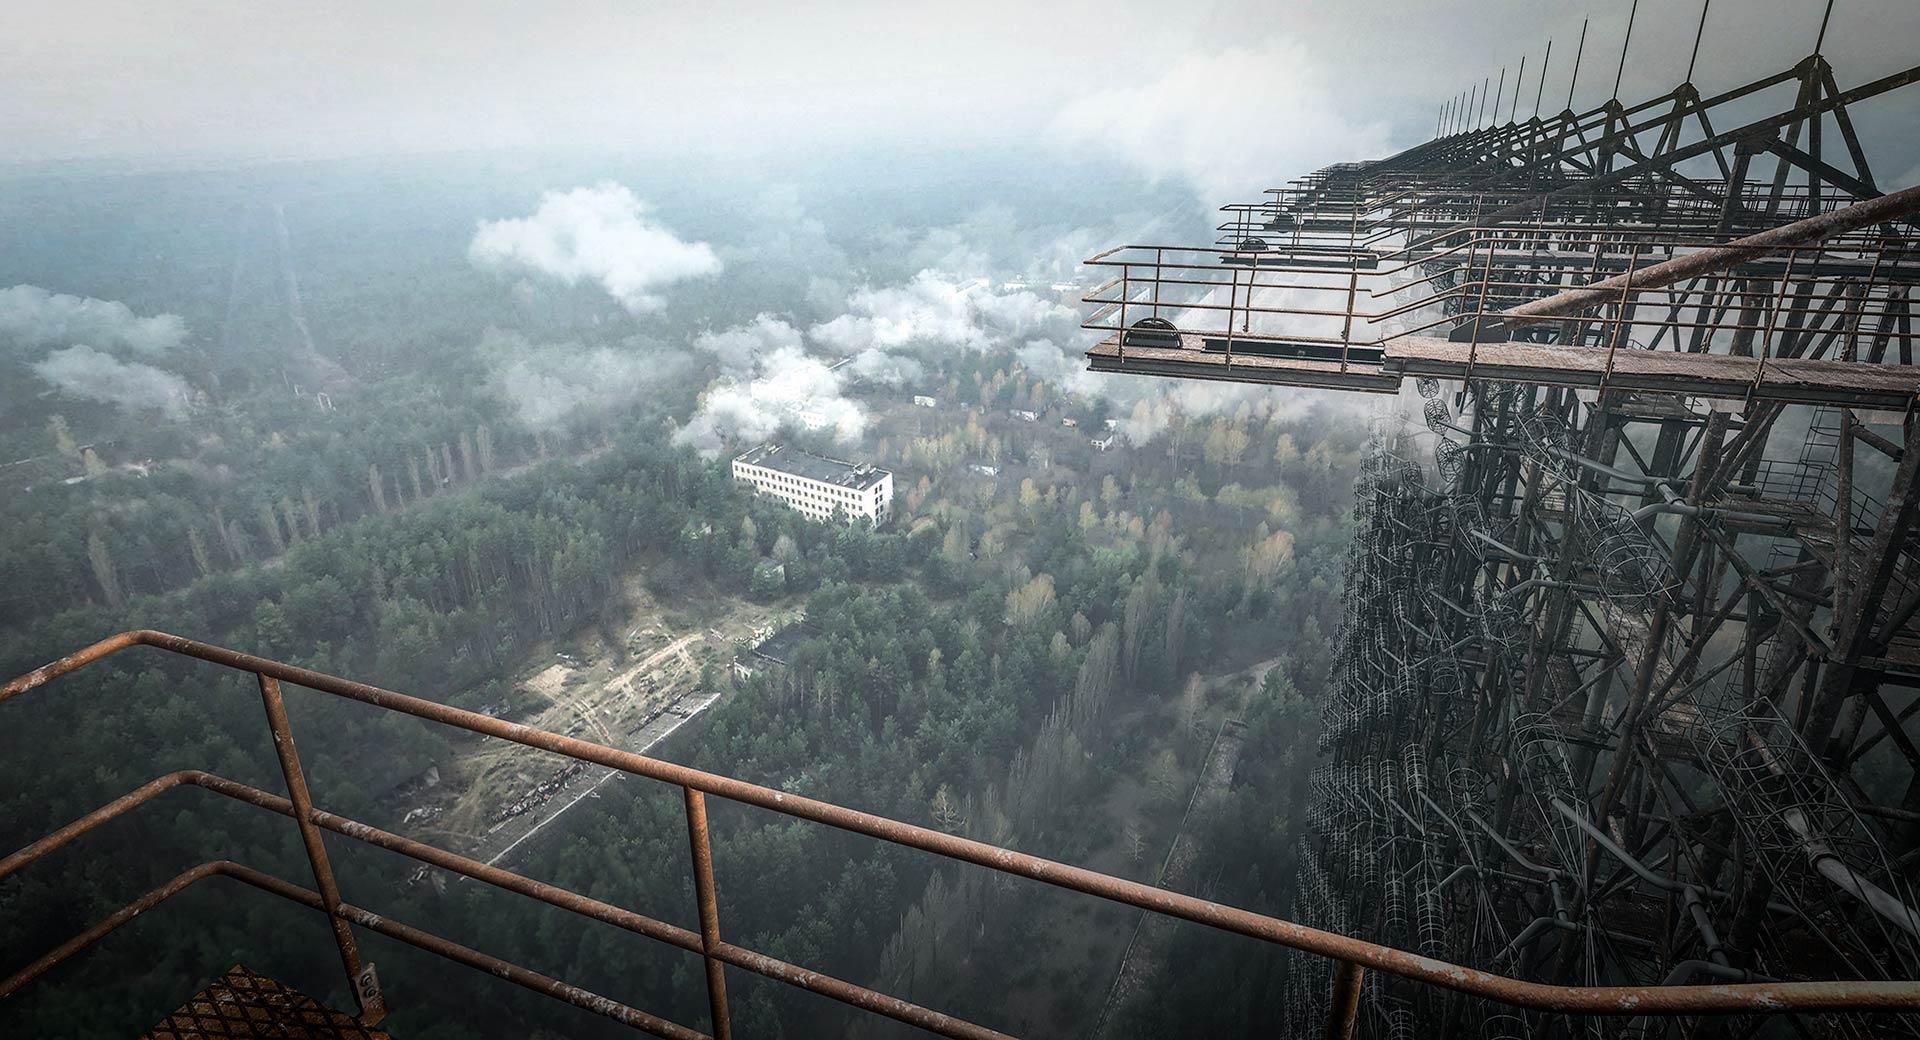 Chernobyl VR Project Releases On PSVR